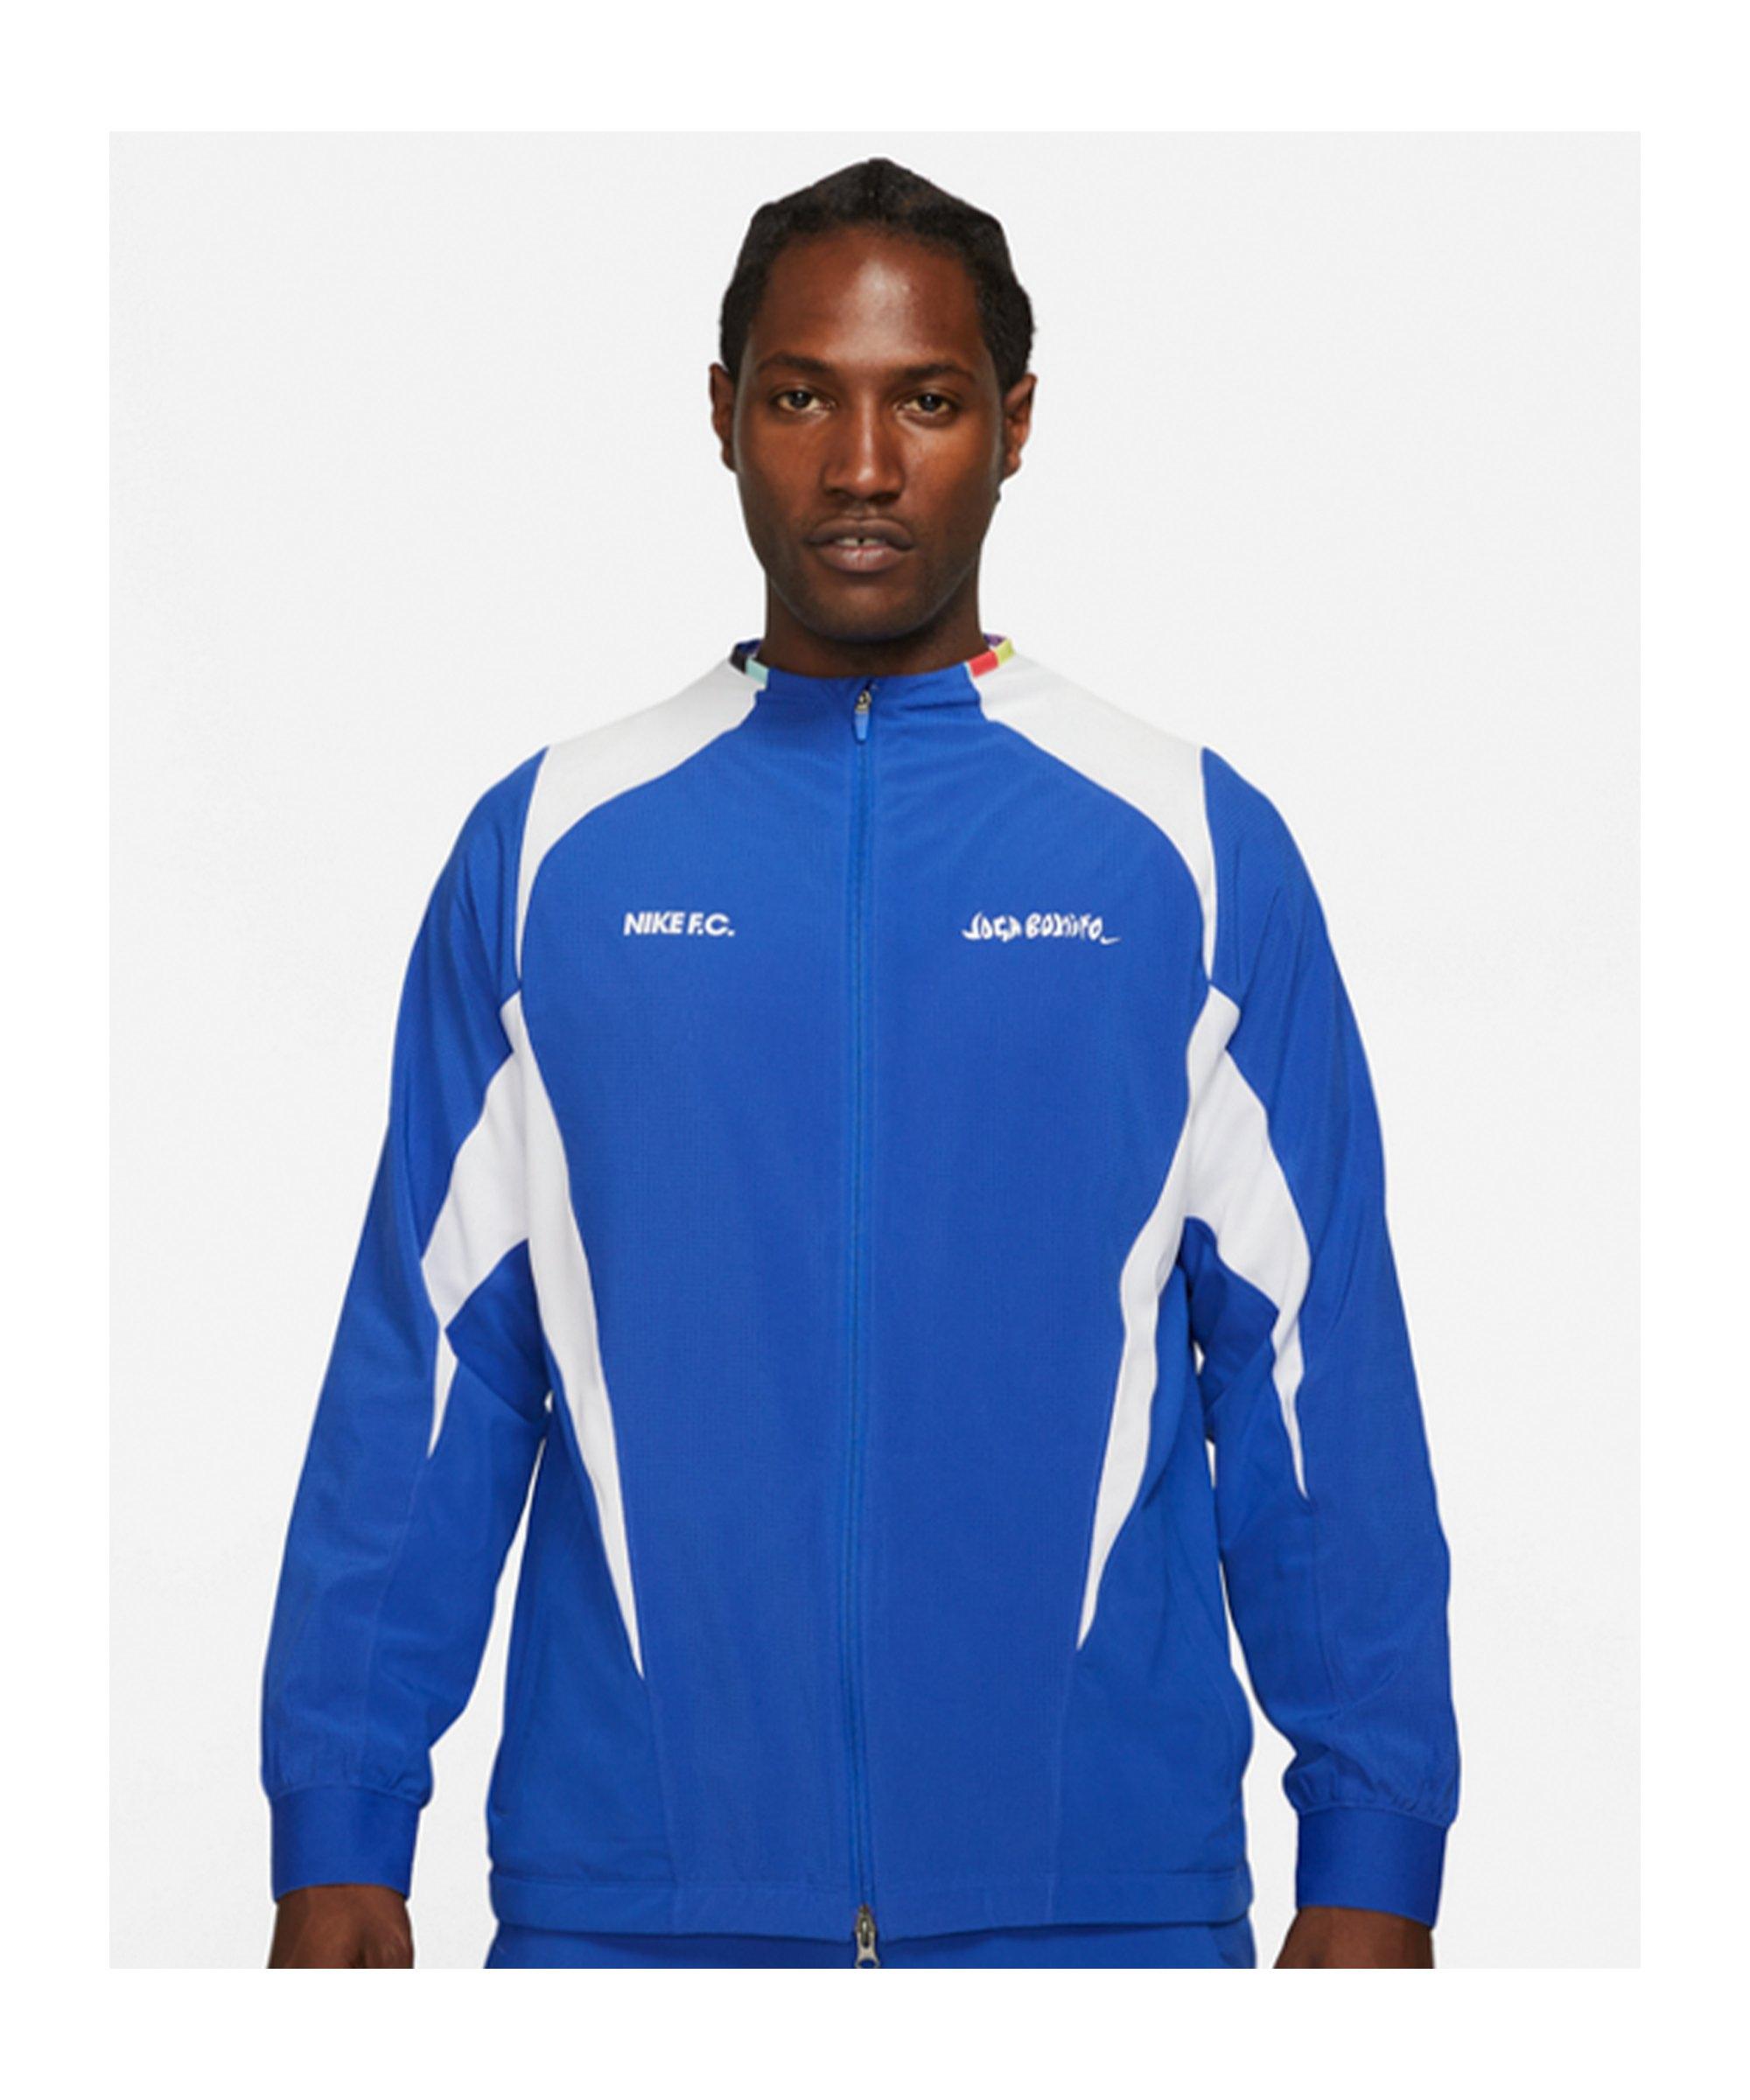 Nike F.C. Joga Bonito Woven Jacke Blau F480 - blau